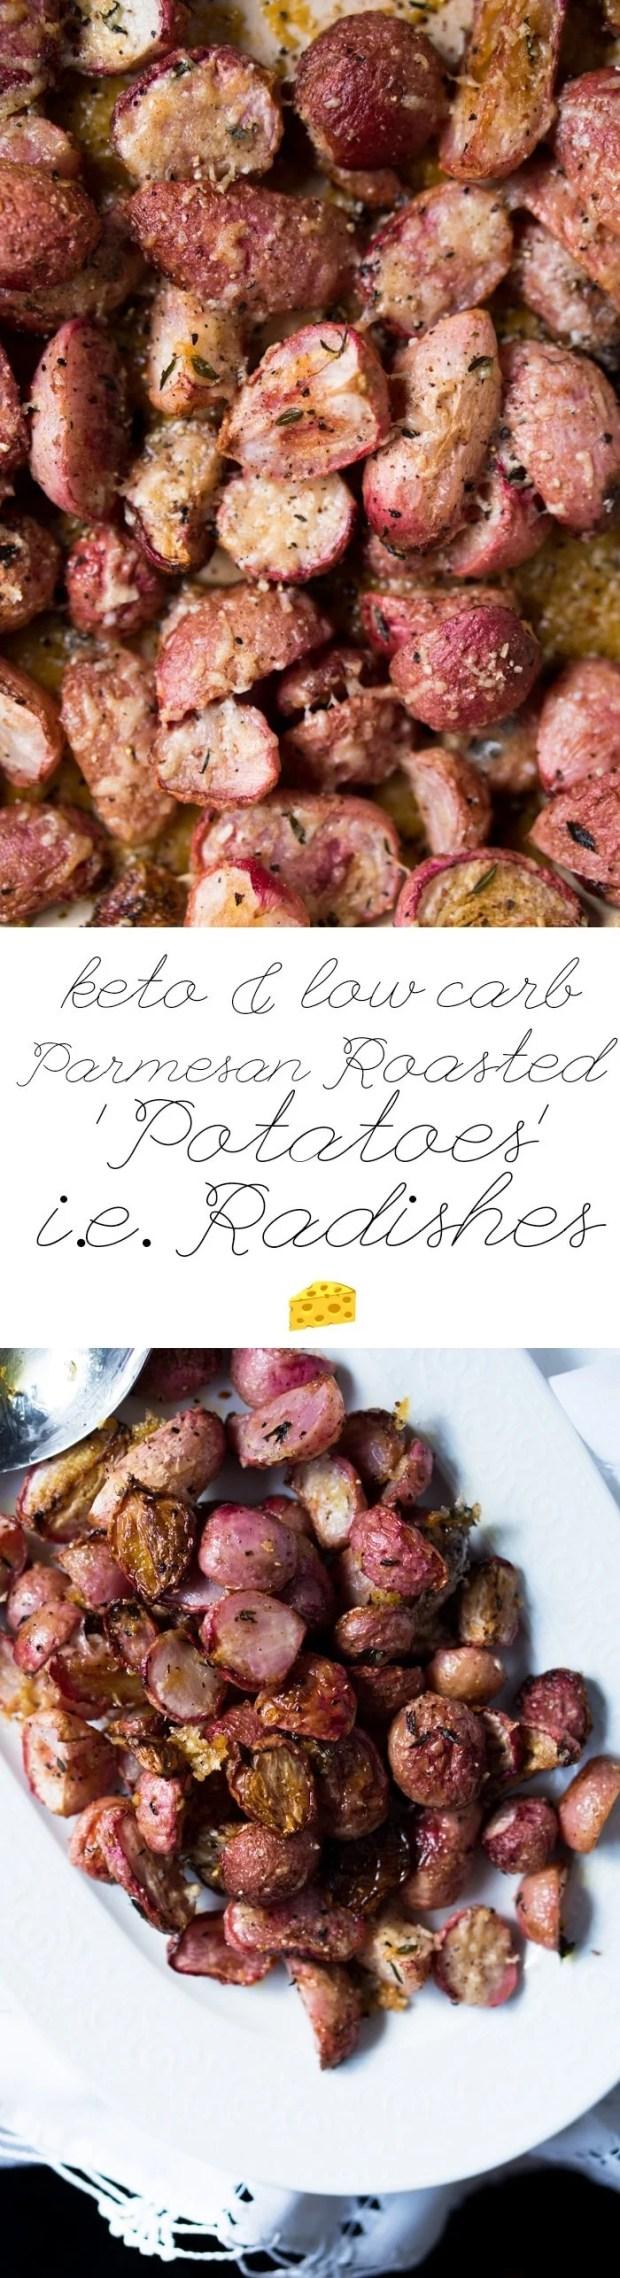 Low Carb & Keto Roasted Radishes; i.e.'Potatoes' 🧀